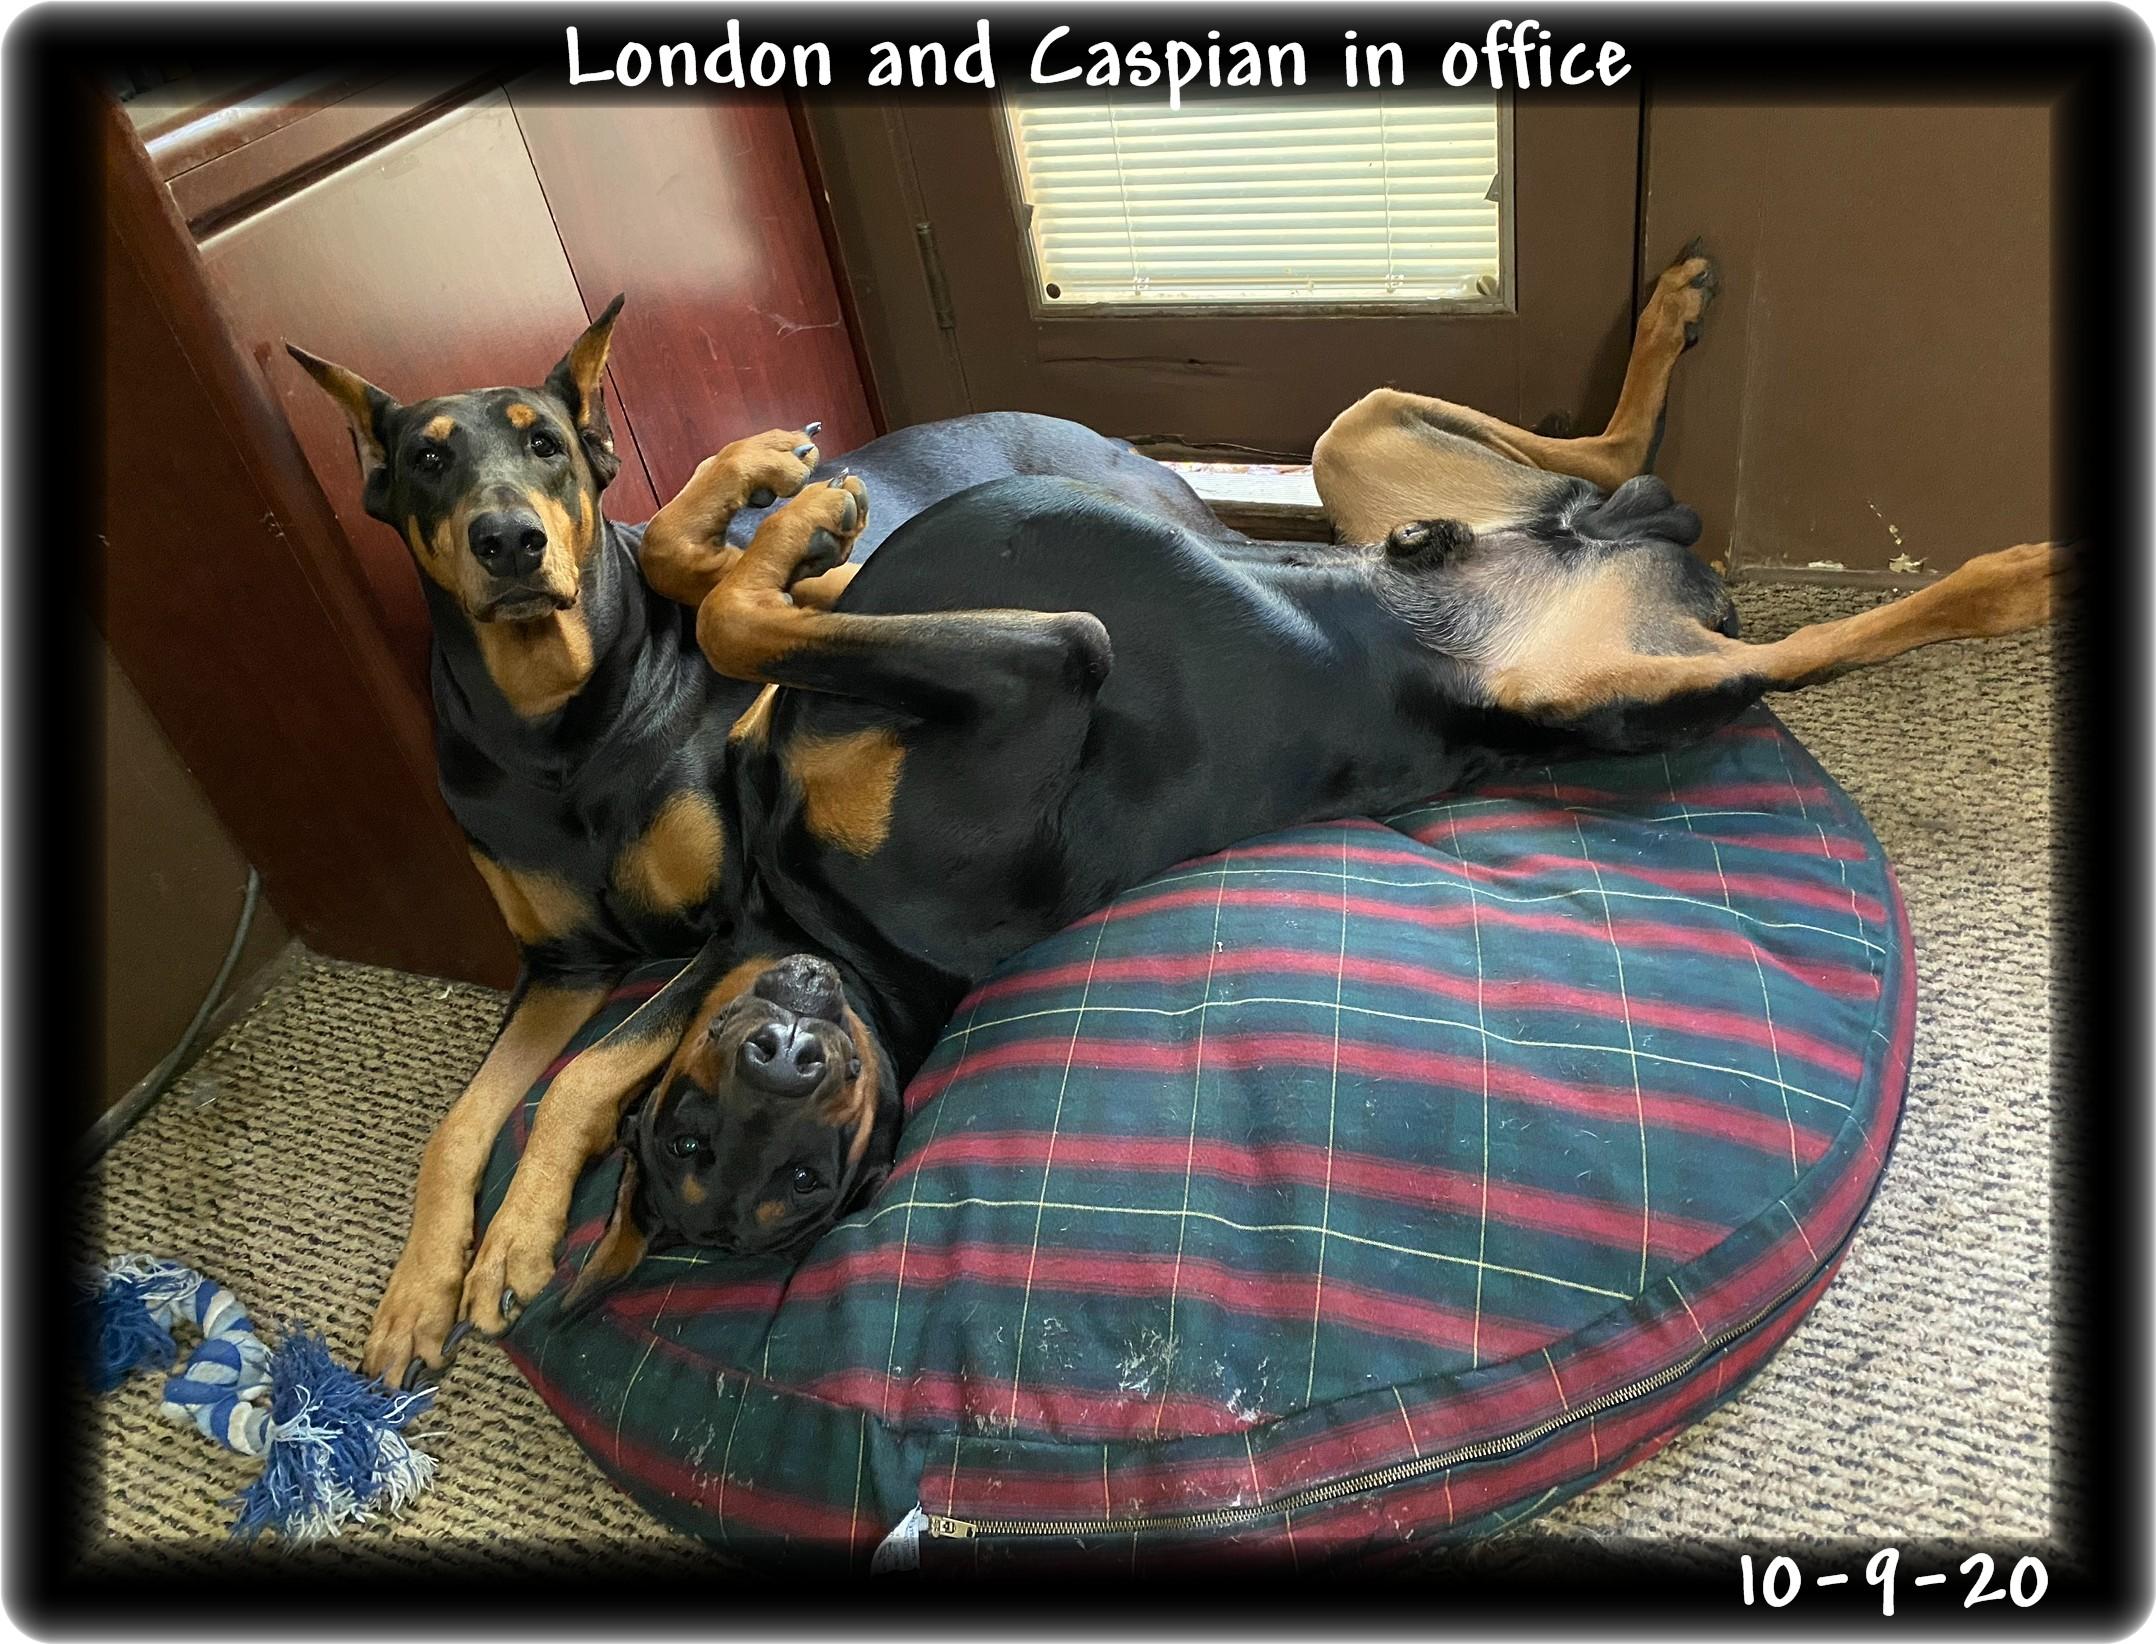 london-caspian-sleeping-togetherimg-5313.jpg